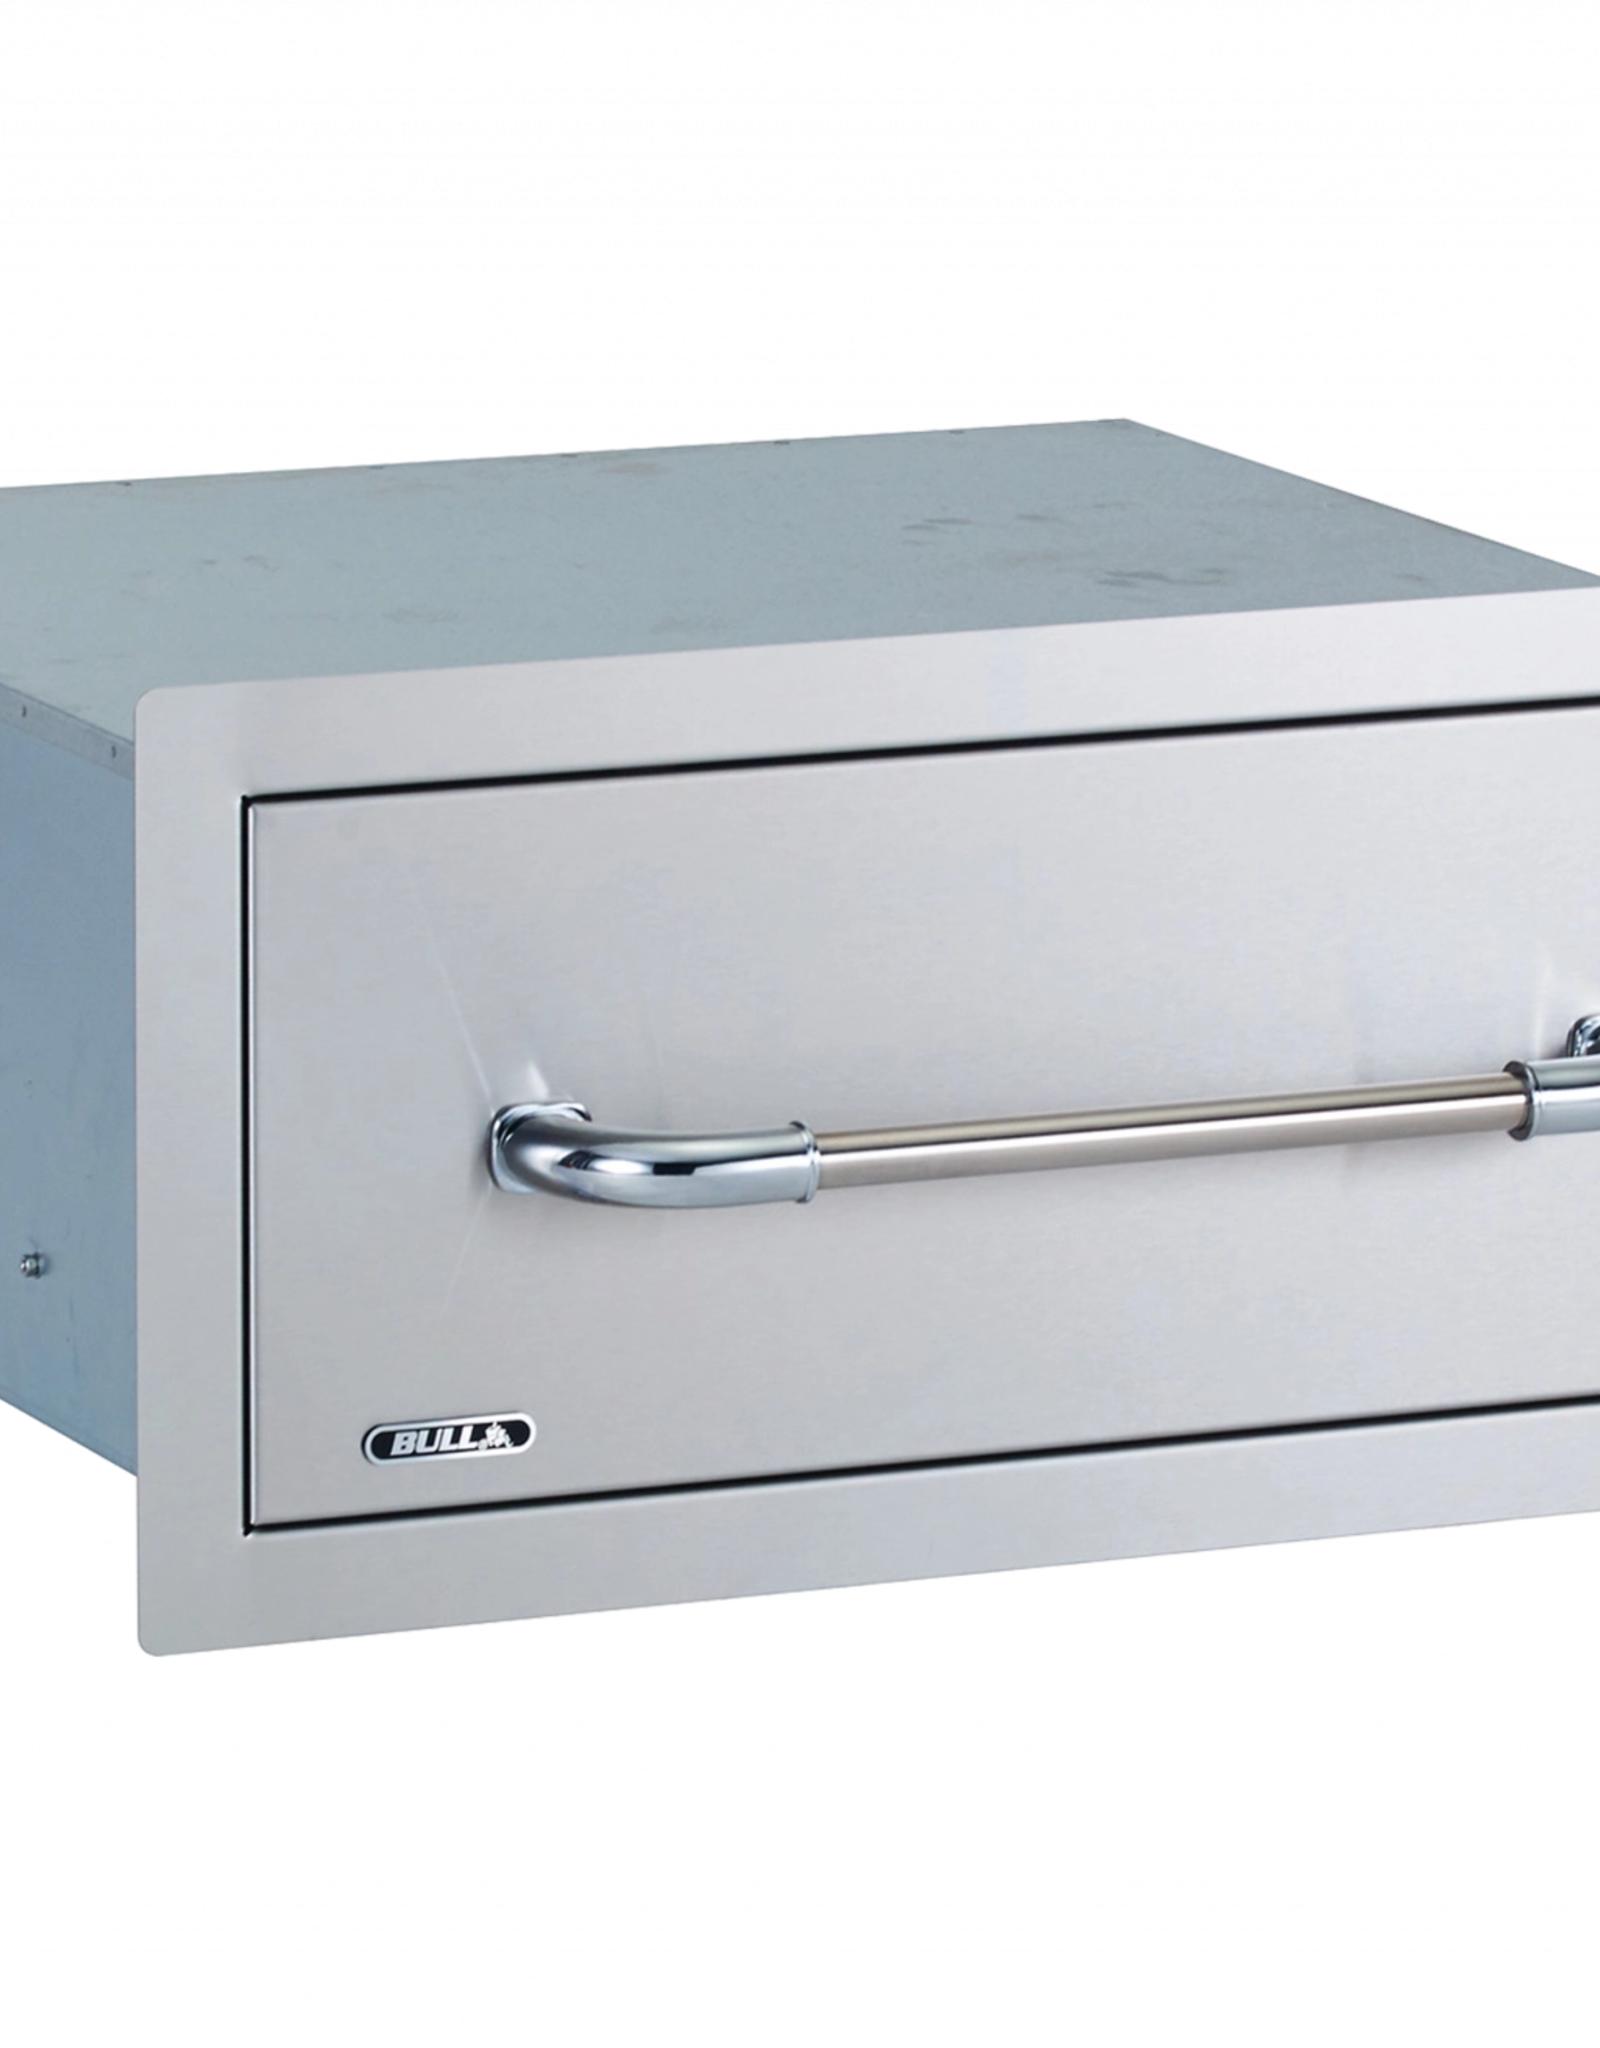 "Bull Bull Large Single Drawer (24"" Depth For Deep Kitchens Only) - 09980"